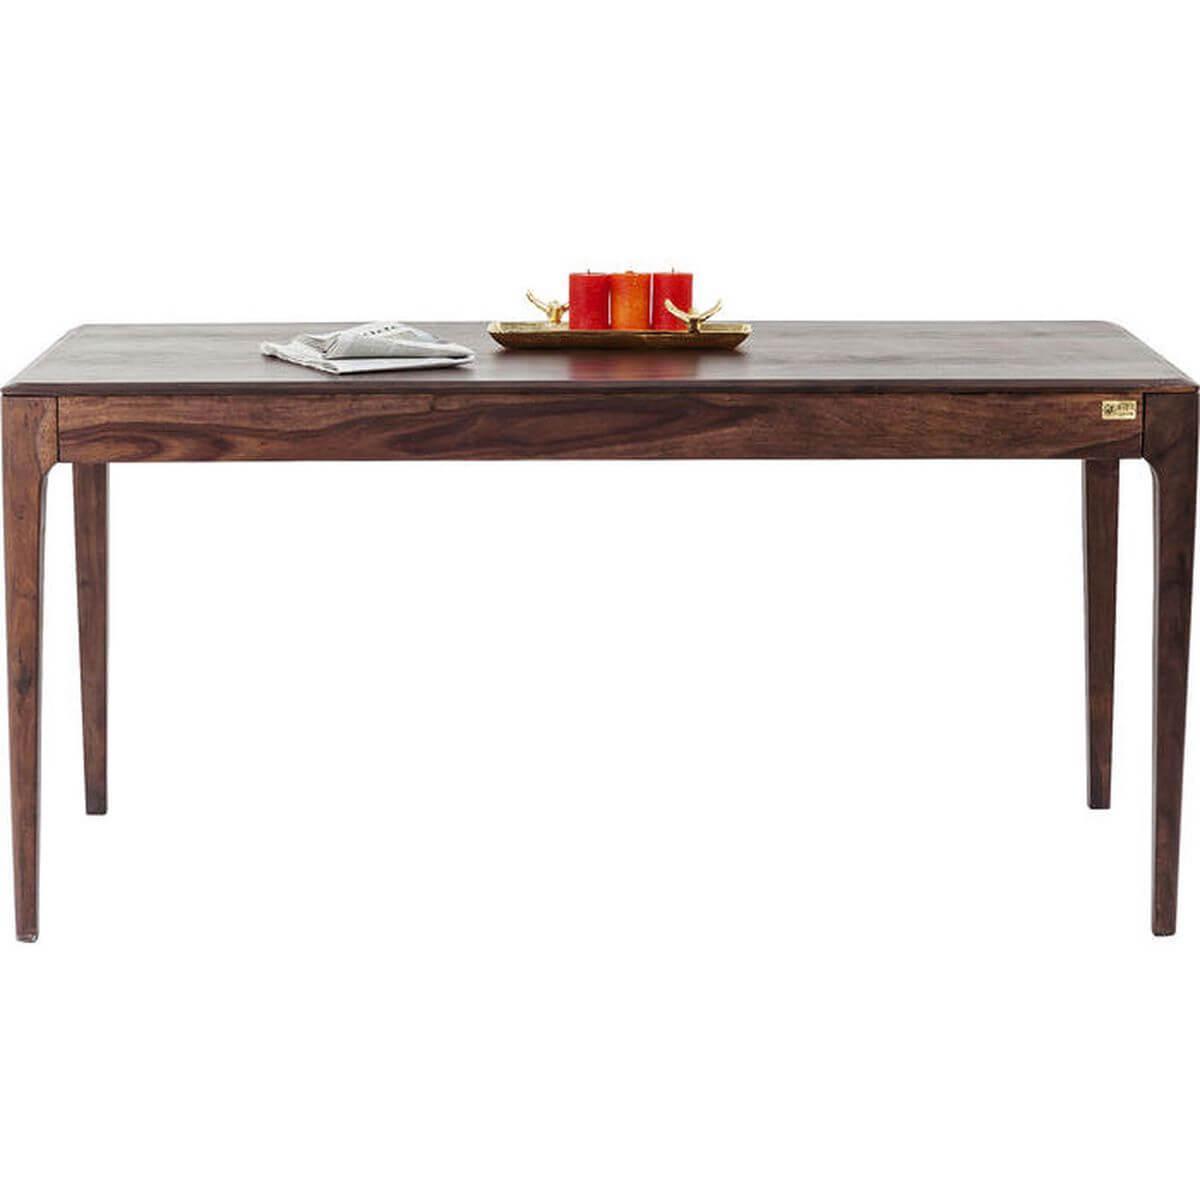 Table Brooklyn Walnut Kare Design 175x90cm